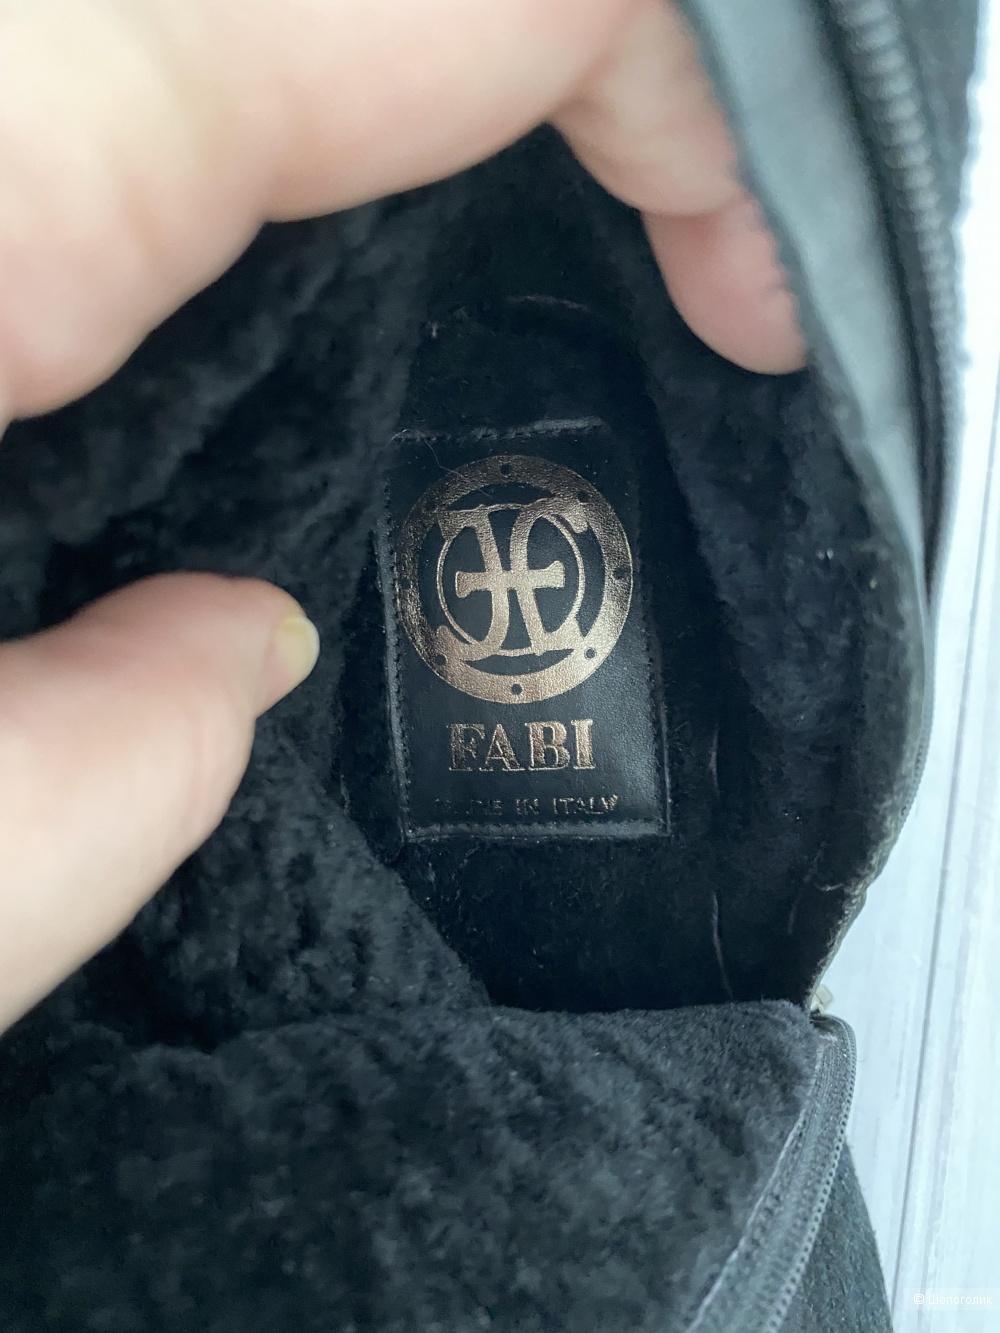 Сапоги Fabi 38 размер